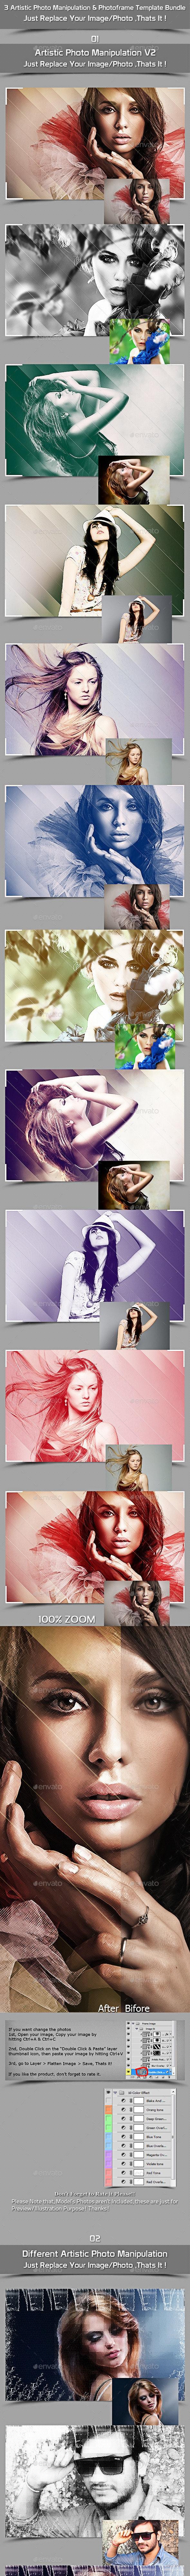 3 Artistic Photo Manipulation & Template Bundle - Photo Templates Graphics